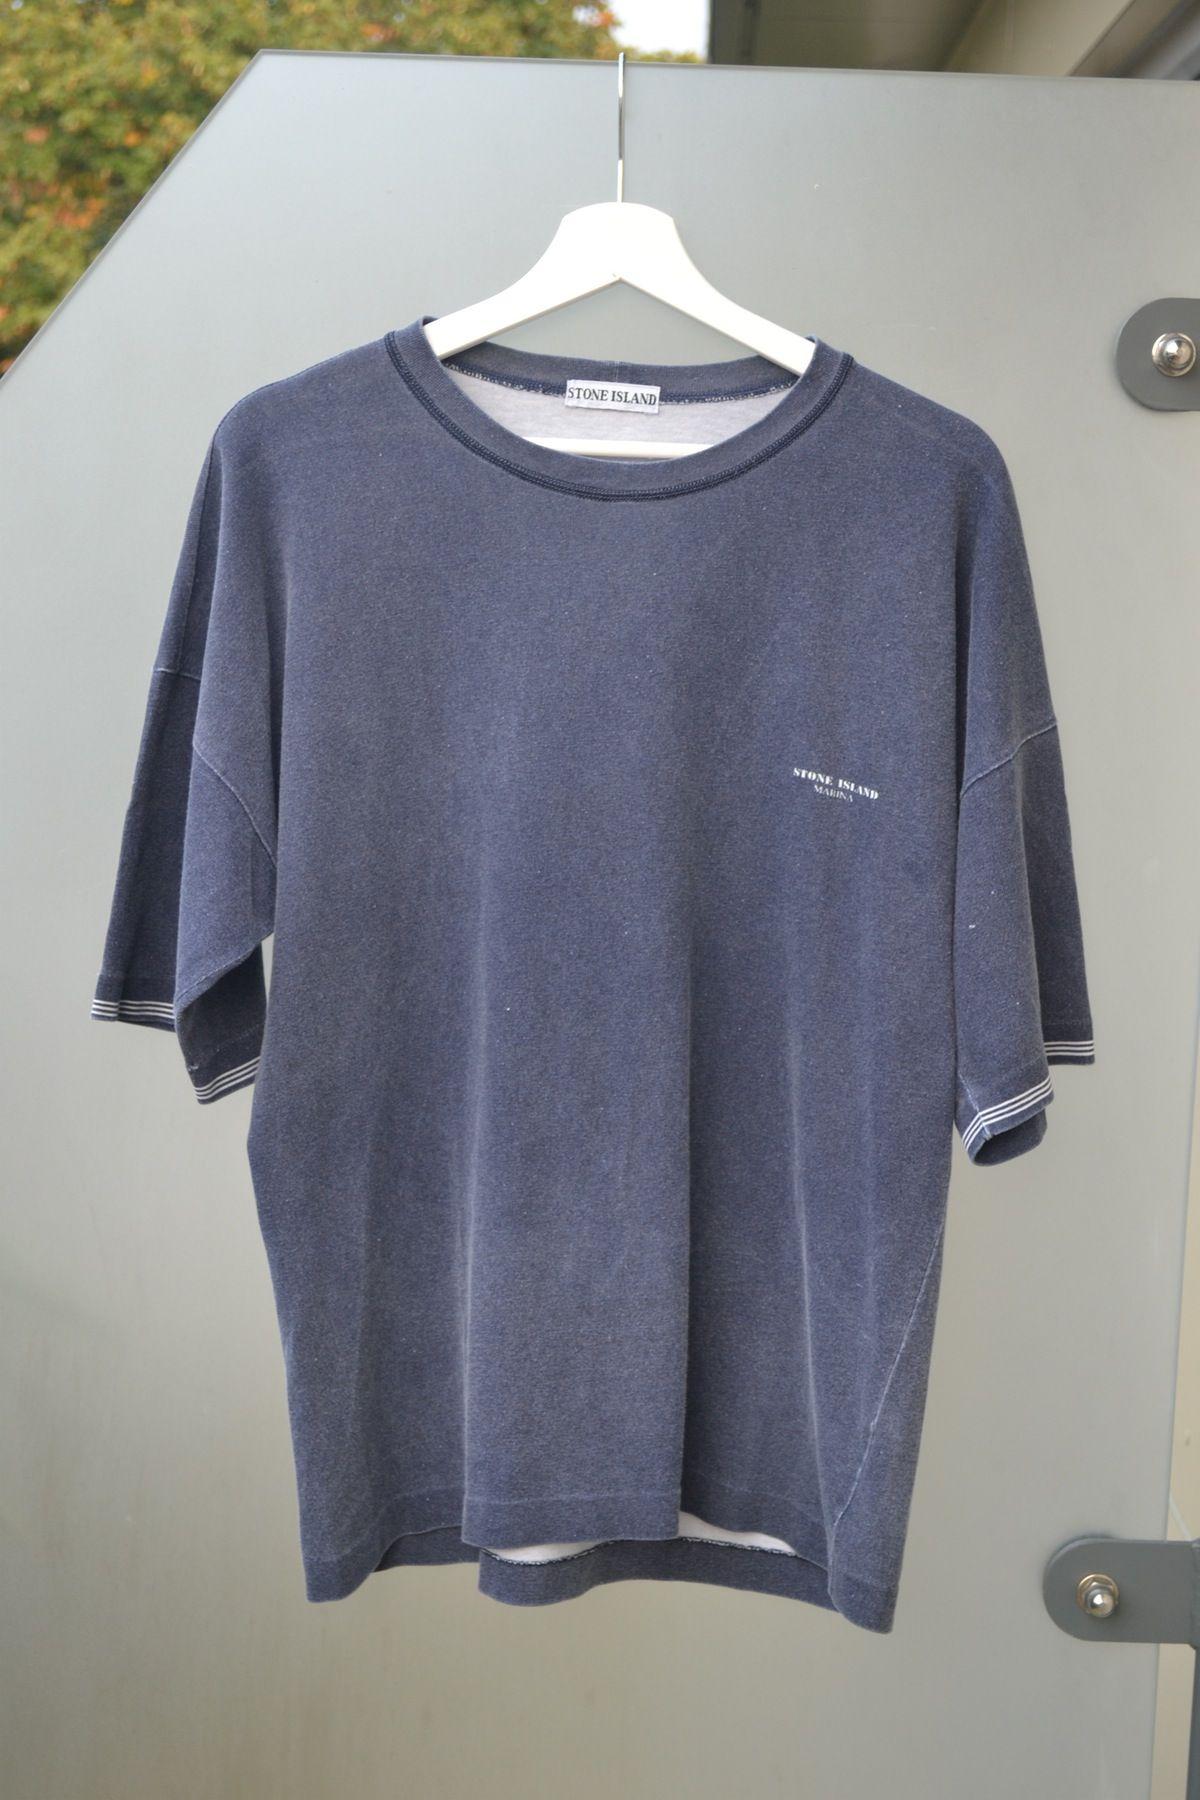 Image Of Vintage 90 S Stone Island Marina T Shirt Long Sleeve Tshirt Men Cool Shirts Mens Tops